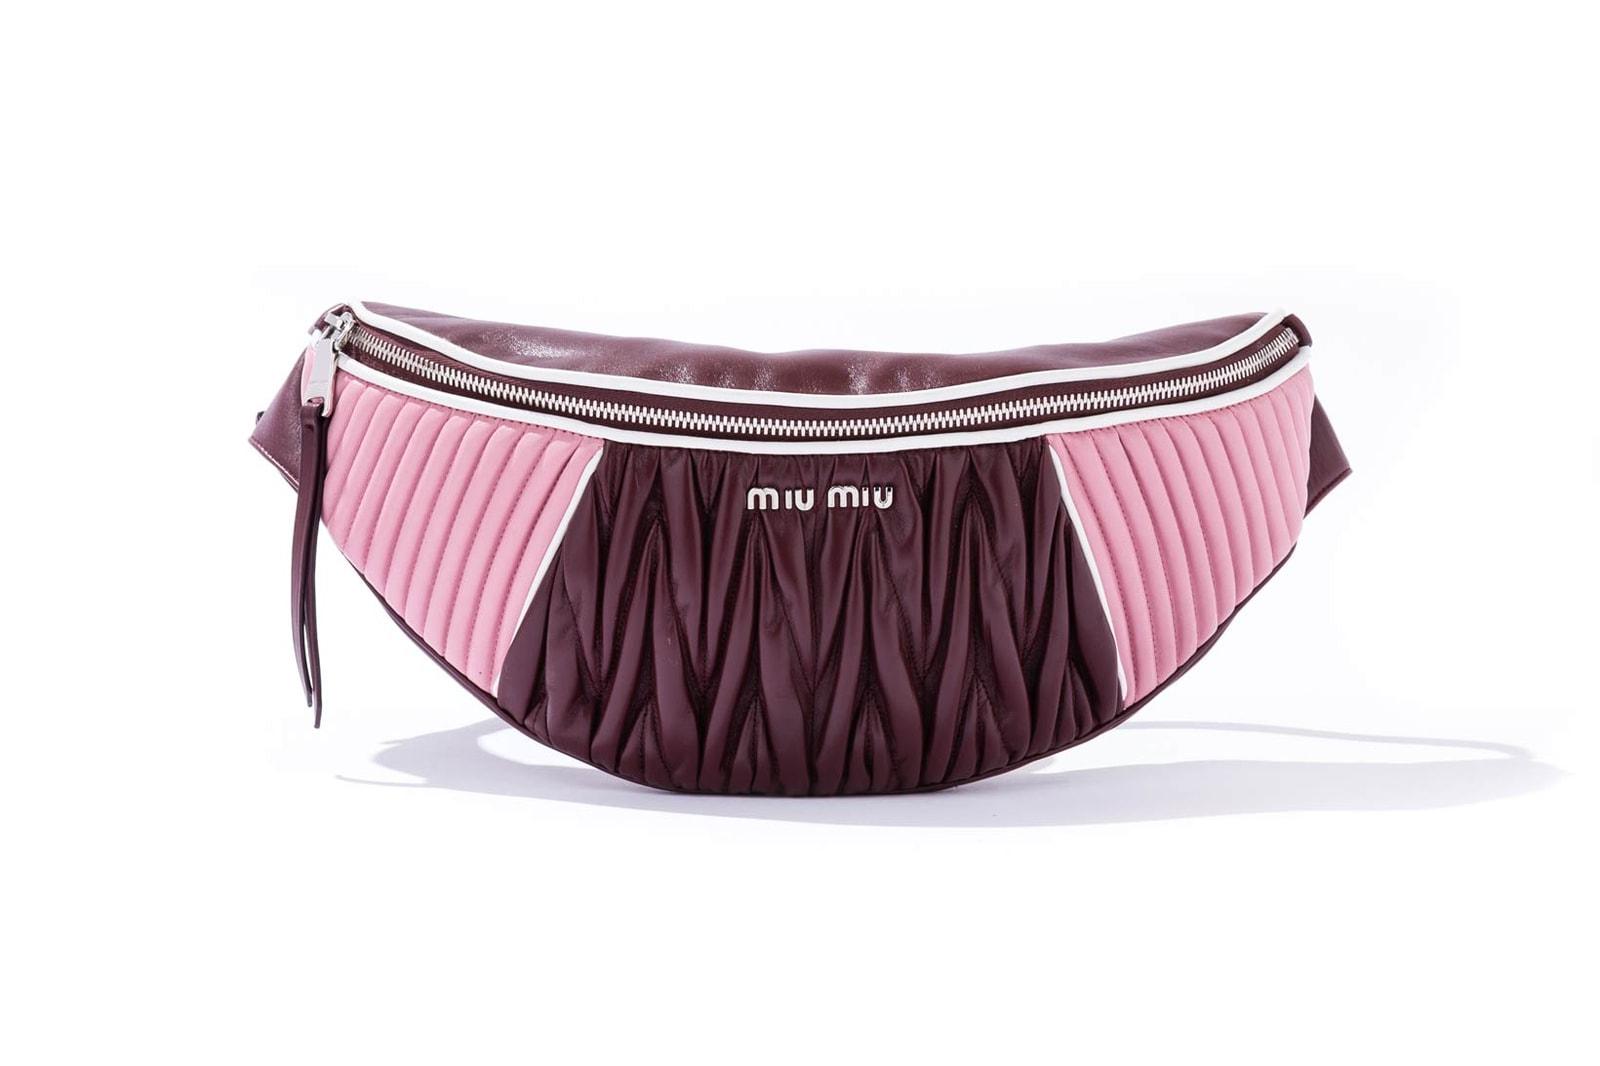 Miu Miu Rider Bag Fanny Pack